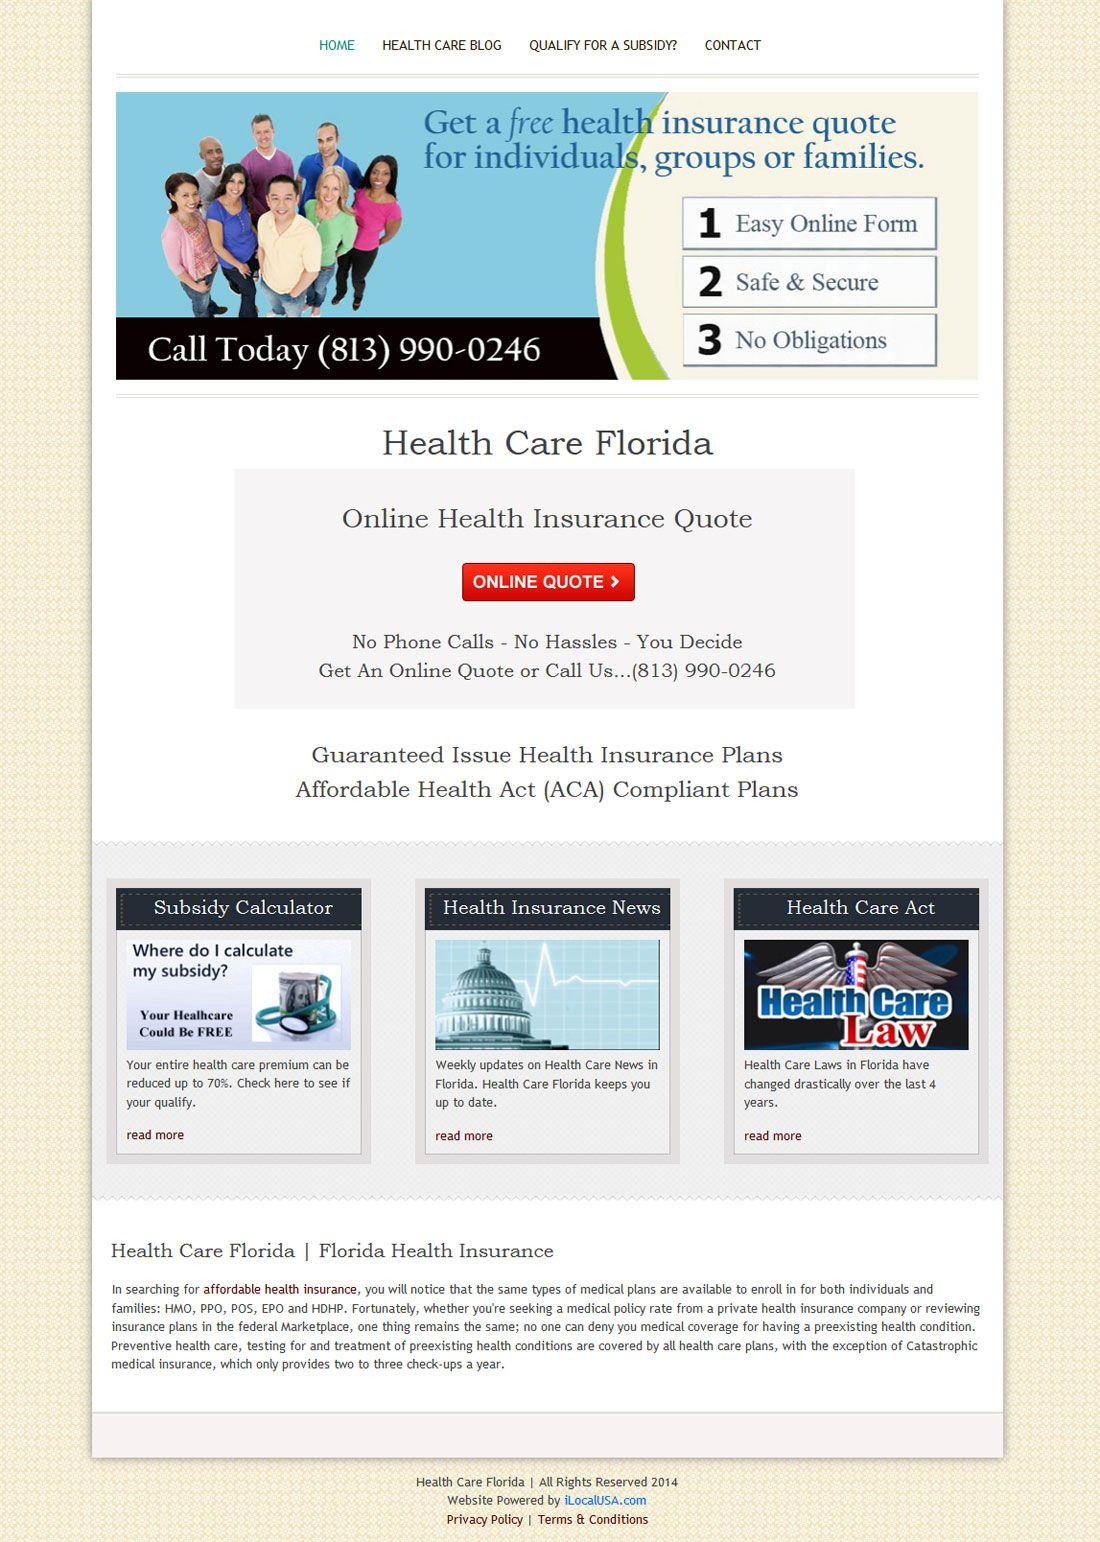 Health Care Florida Health insurance quote, Health